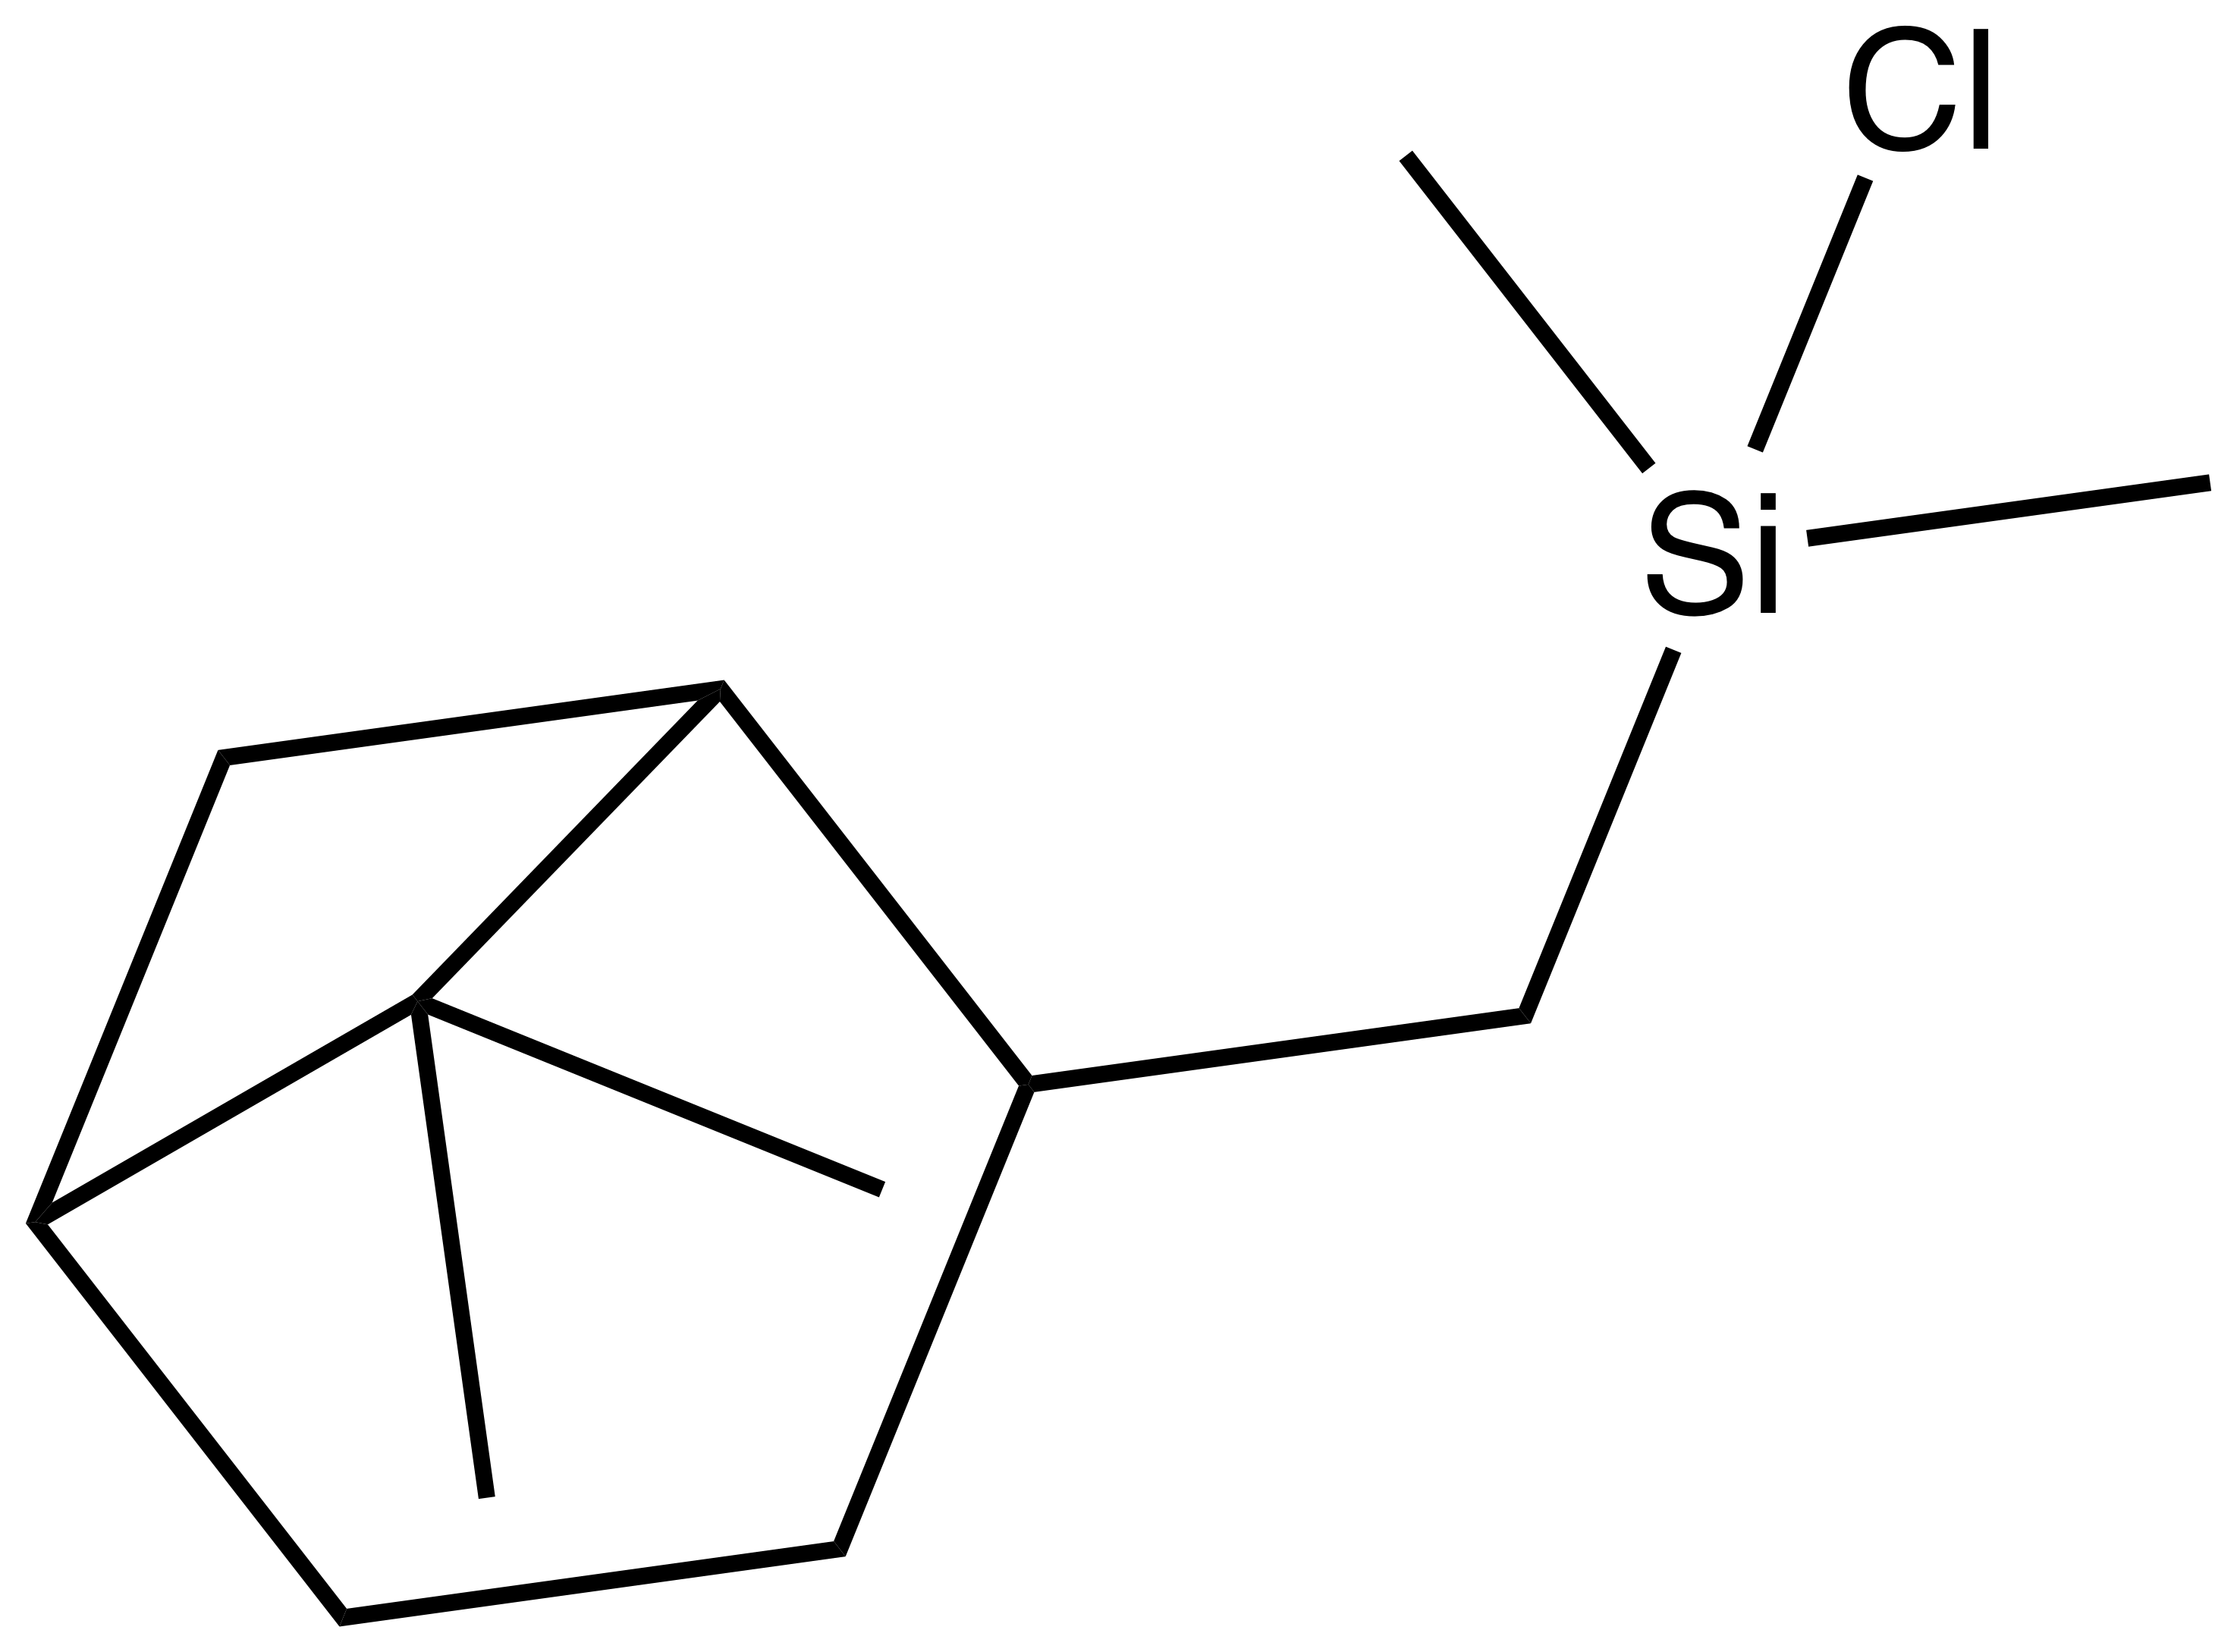 72269-53-5